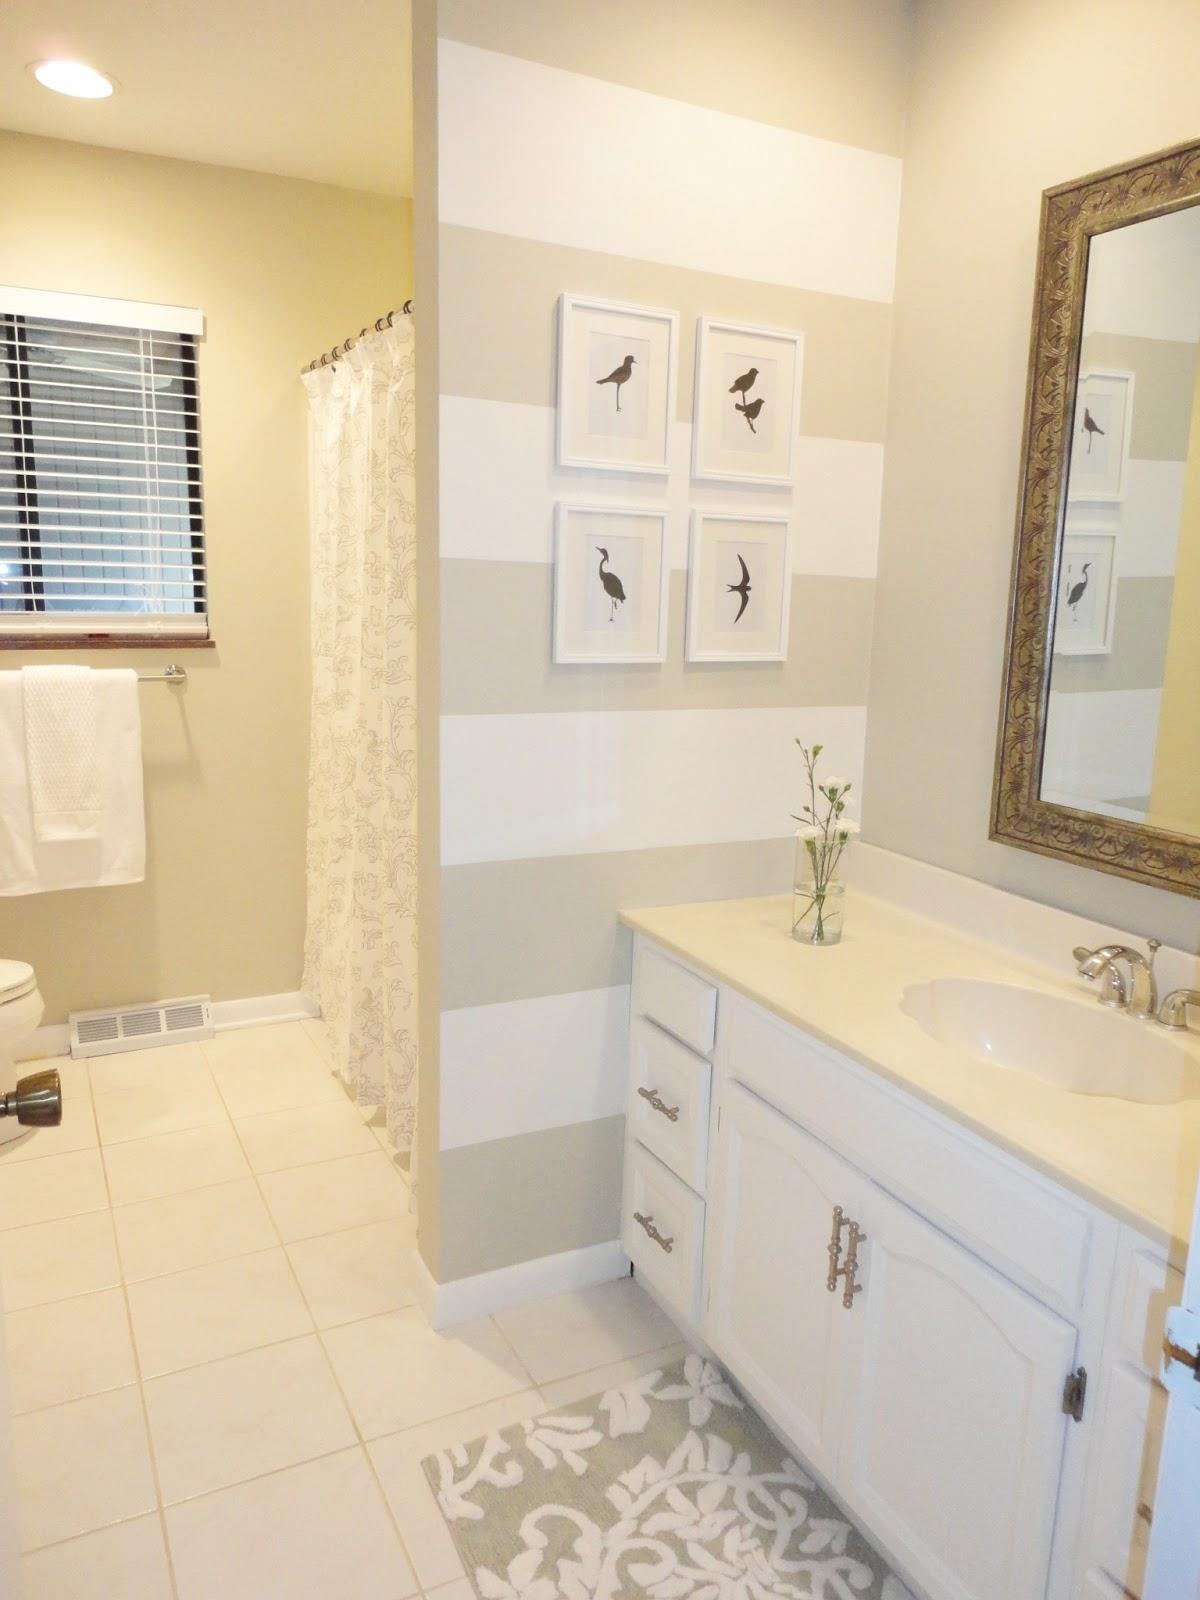 LiveLoveDIY: Our Guest Bathroom Makeover